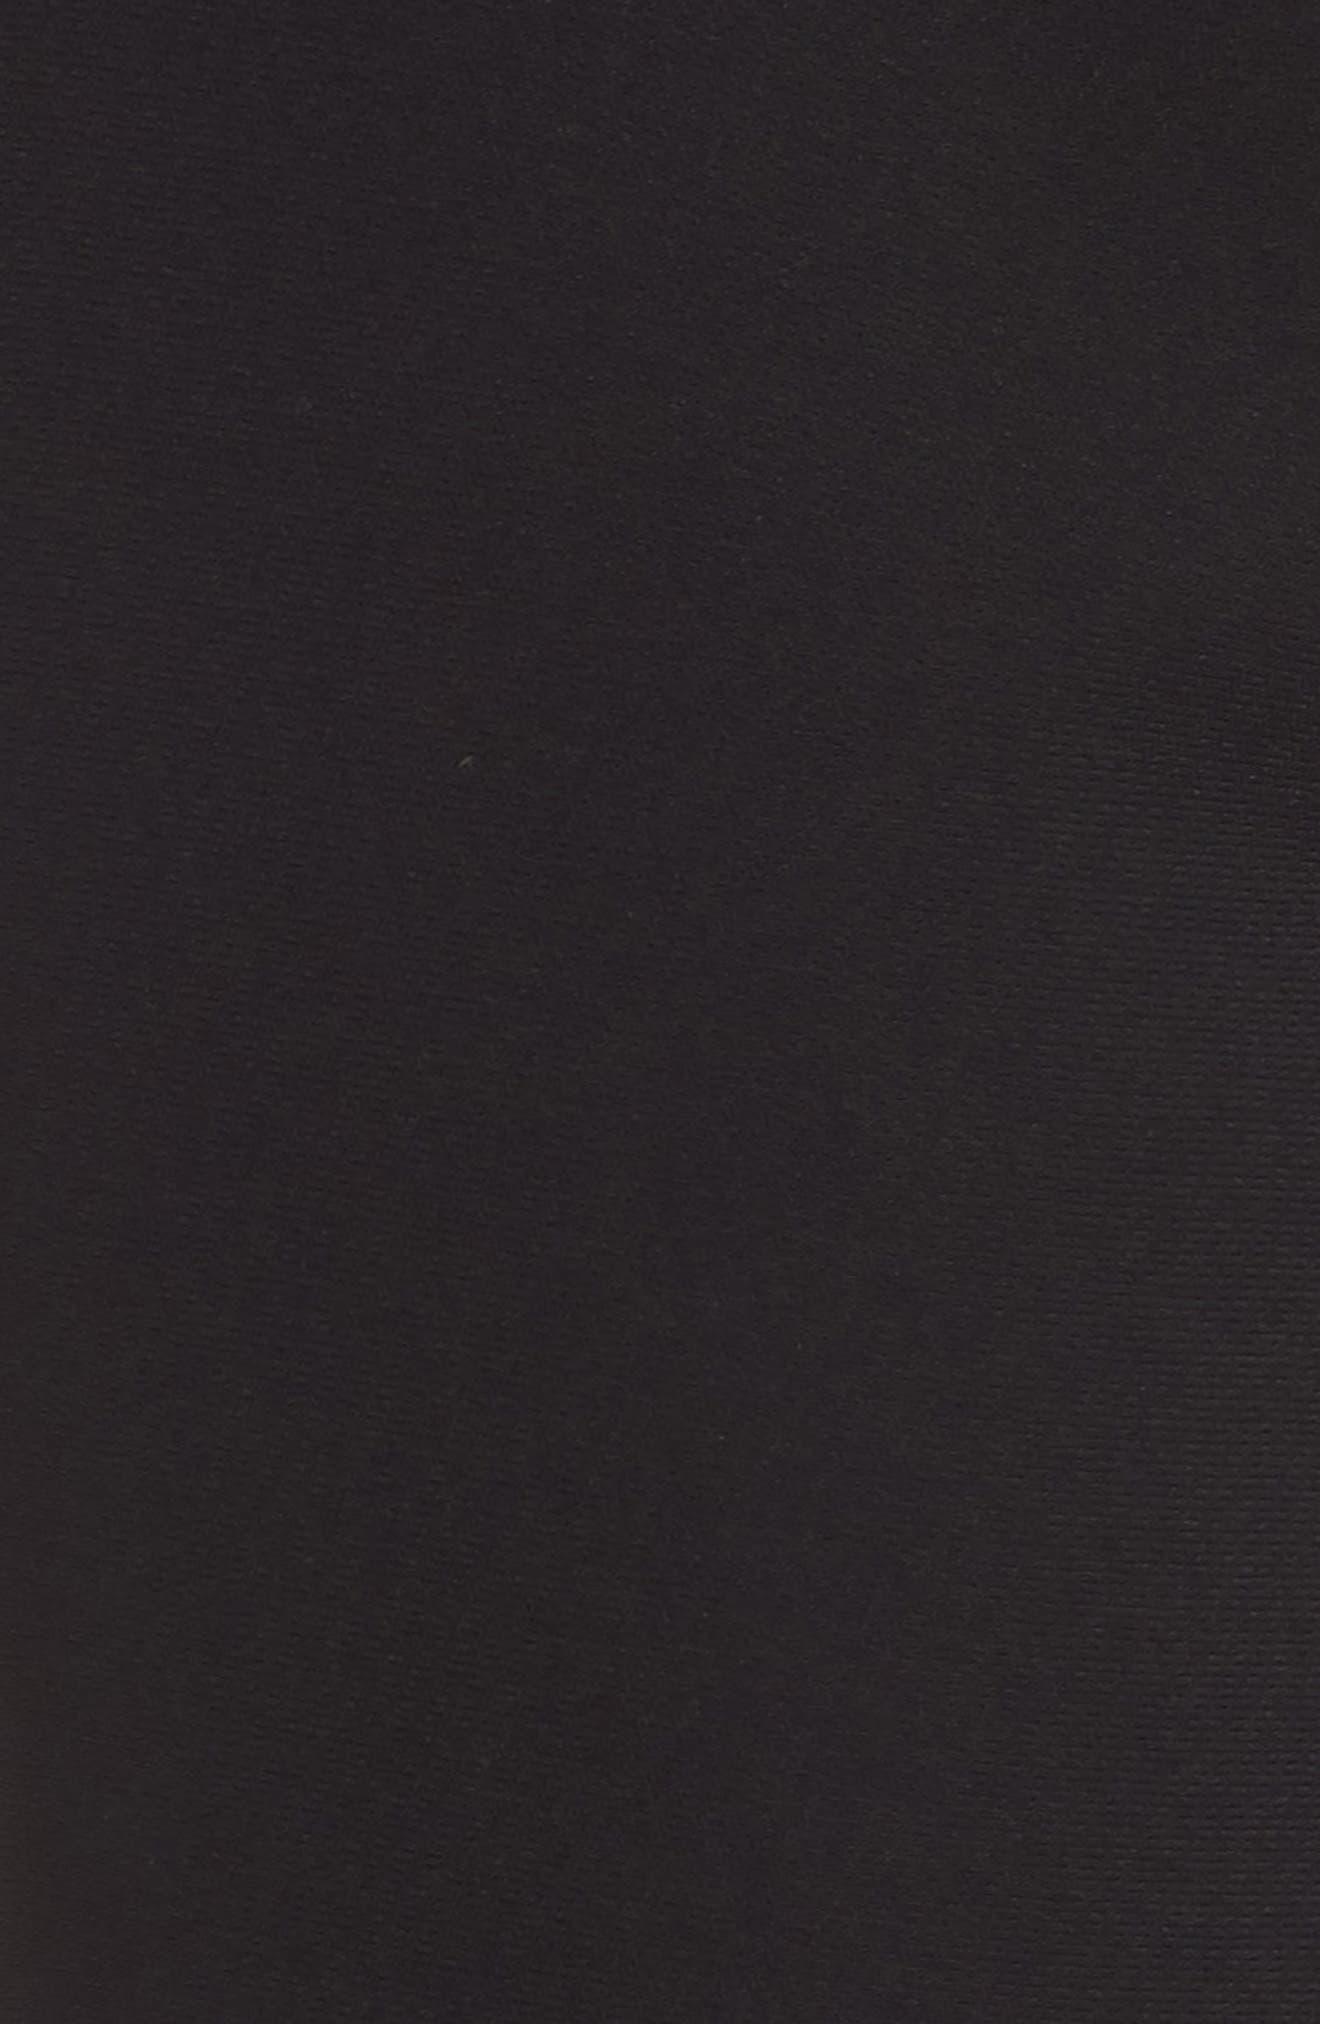 Ruffle Crop Pants,                             Alternate thumbnail 6, color,                             Black